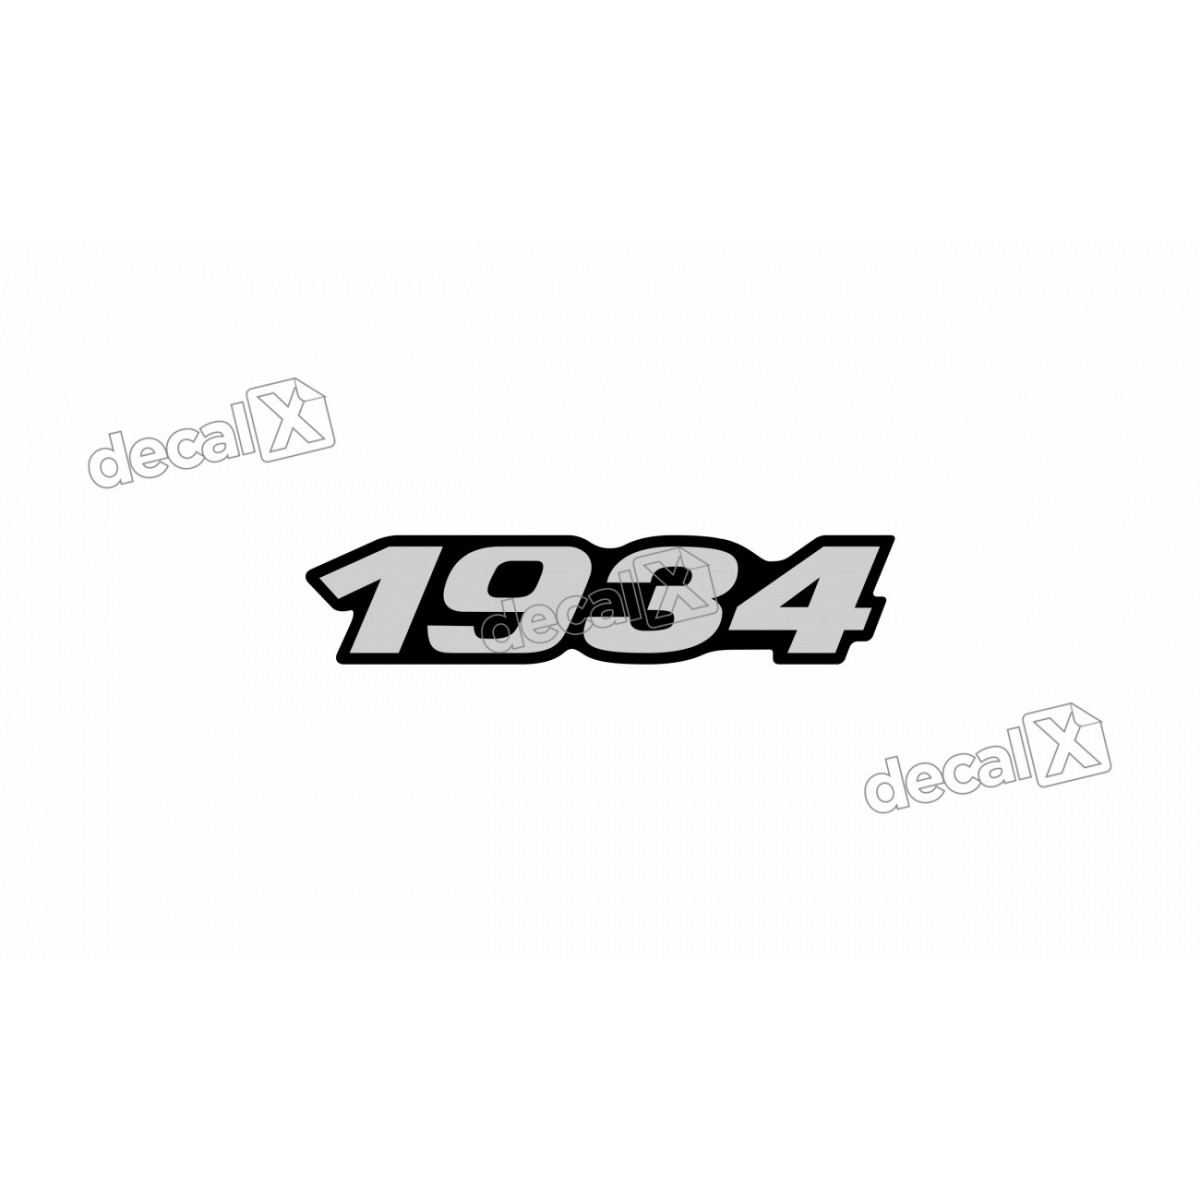 Adesivo Emblema Resinado Mercedes 1934 Cm69 Decalx